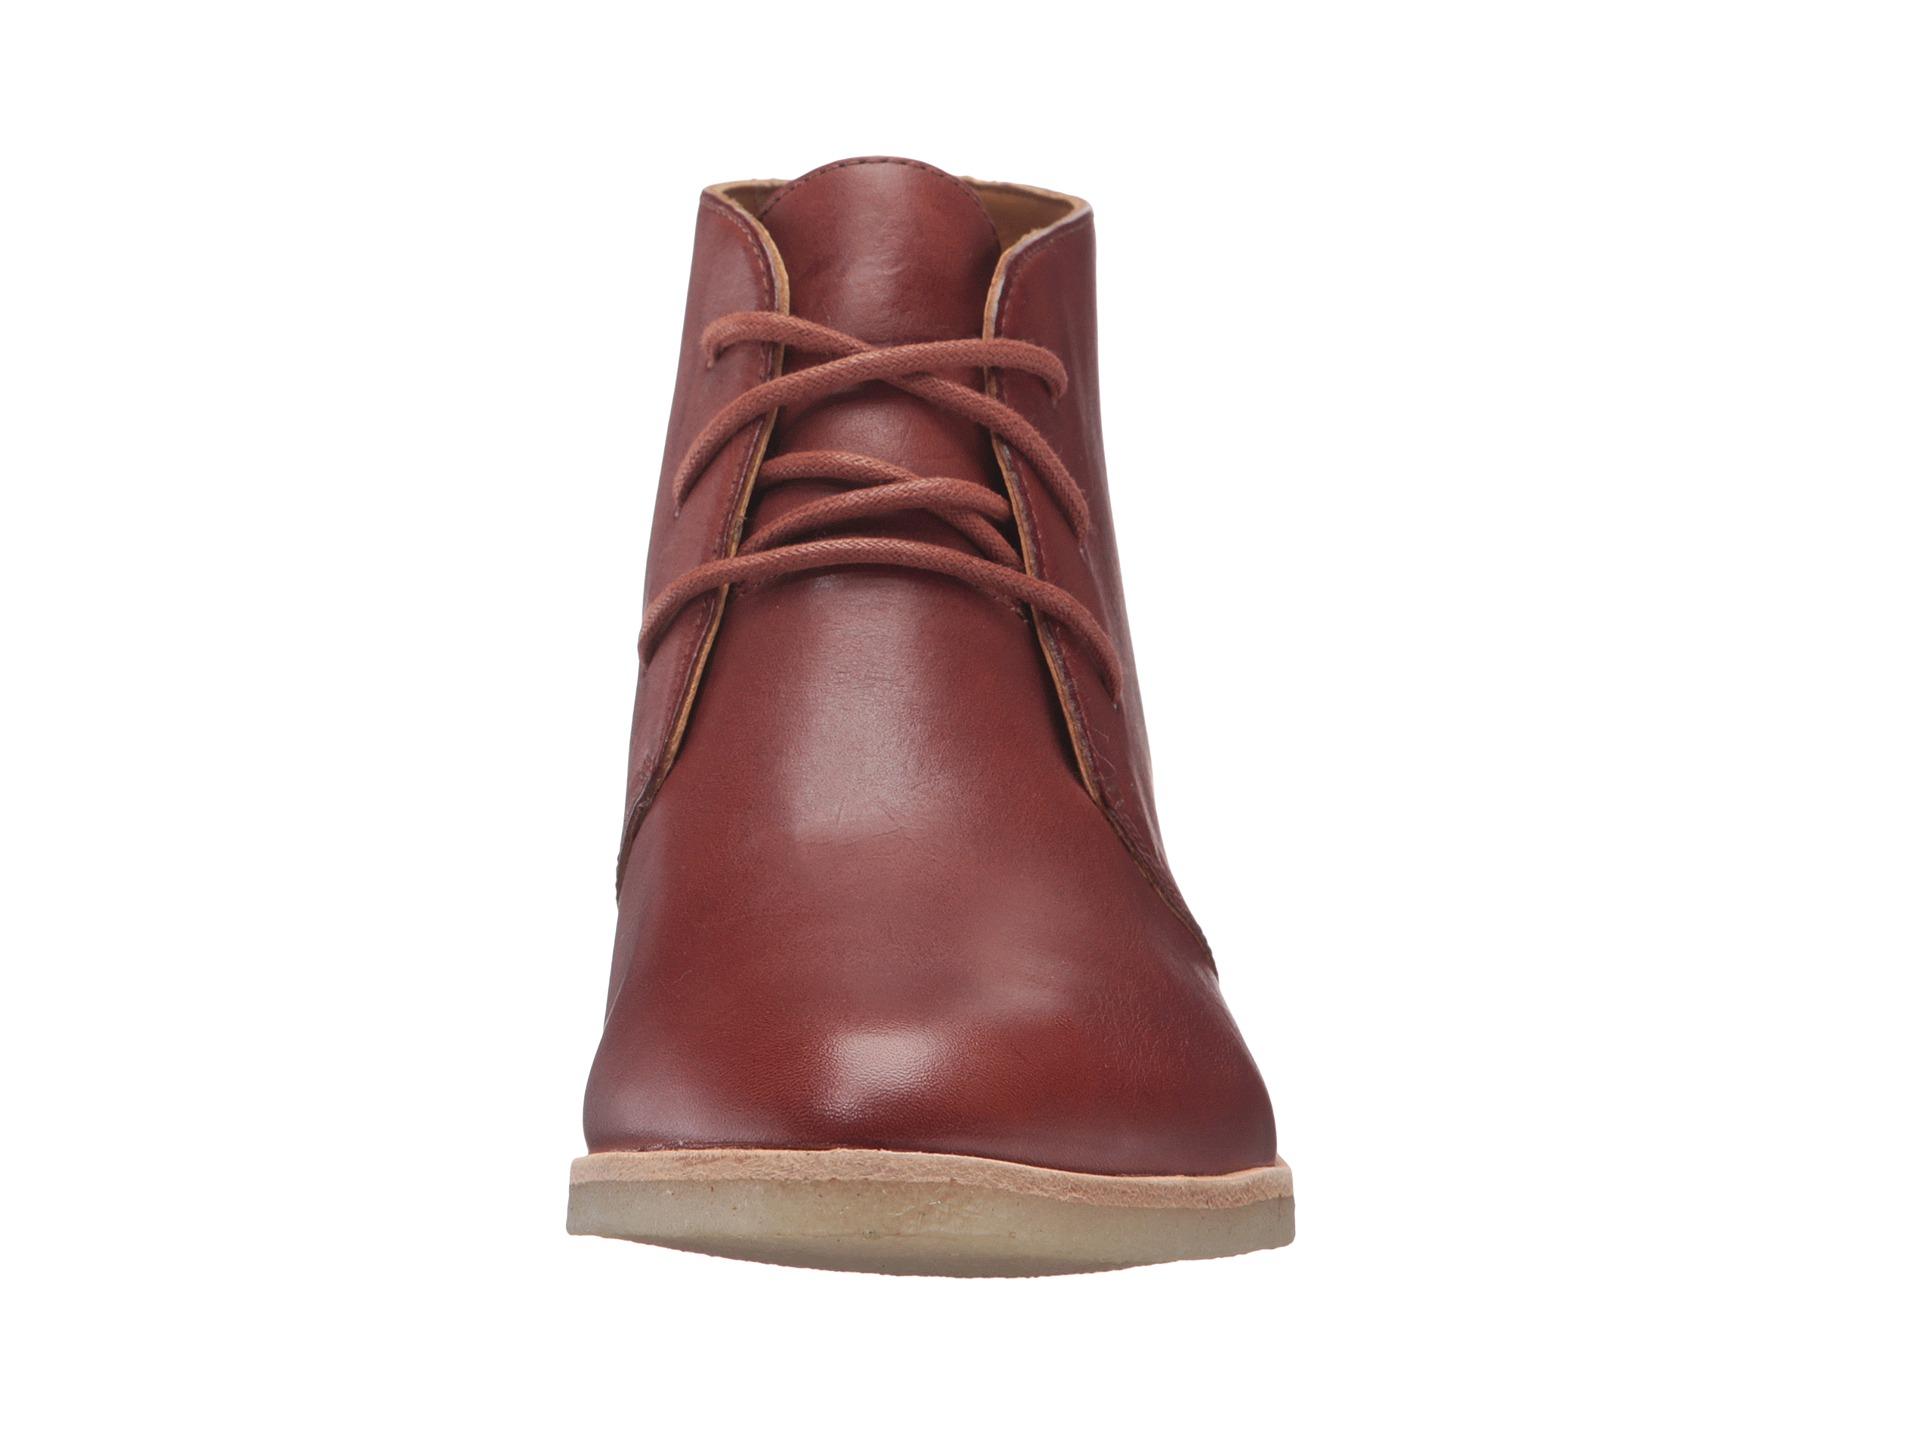 Clarks Phenia Carnaby Tan Leather